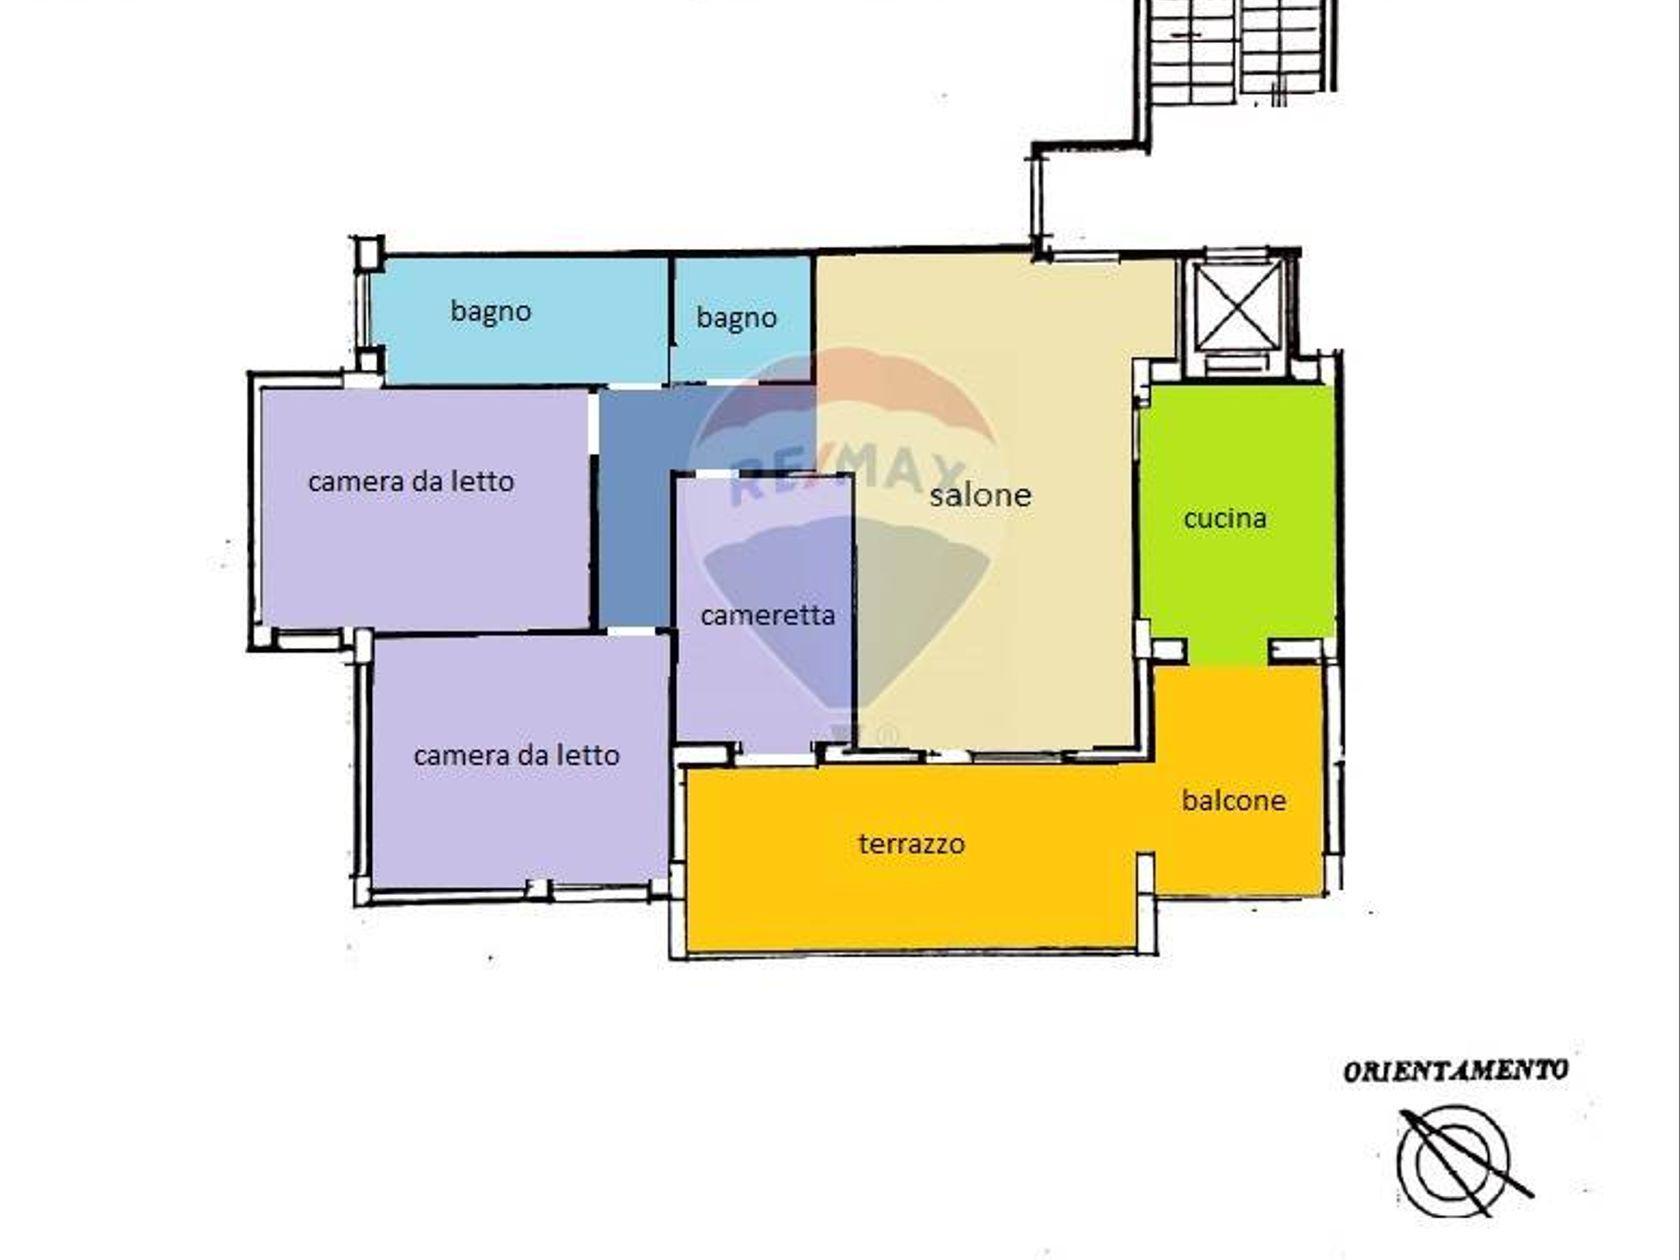 Appartamento Pisana, Roma, RM Vendita - Planimetria 1